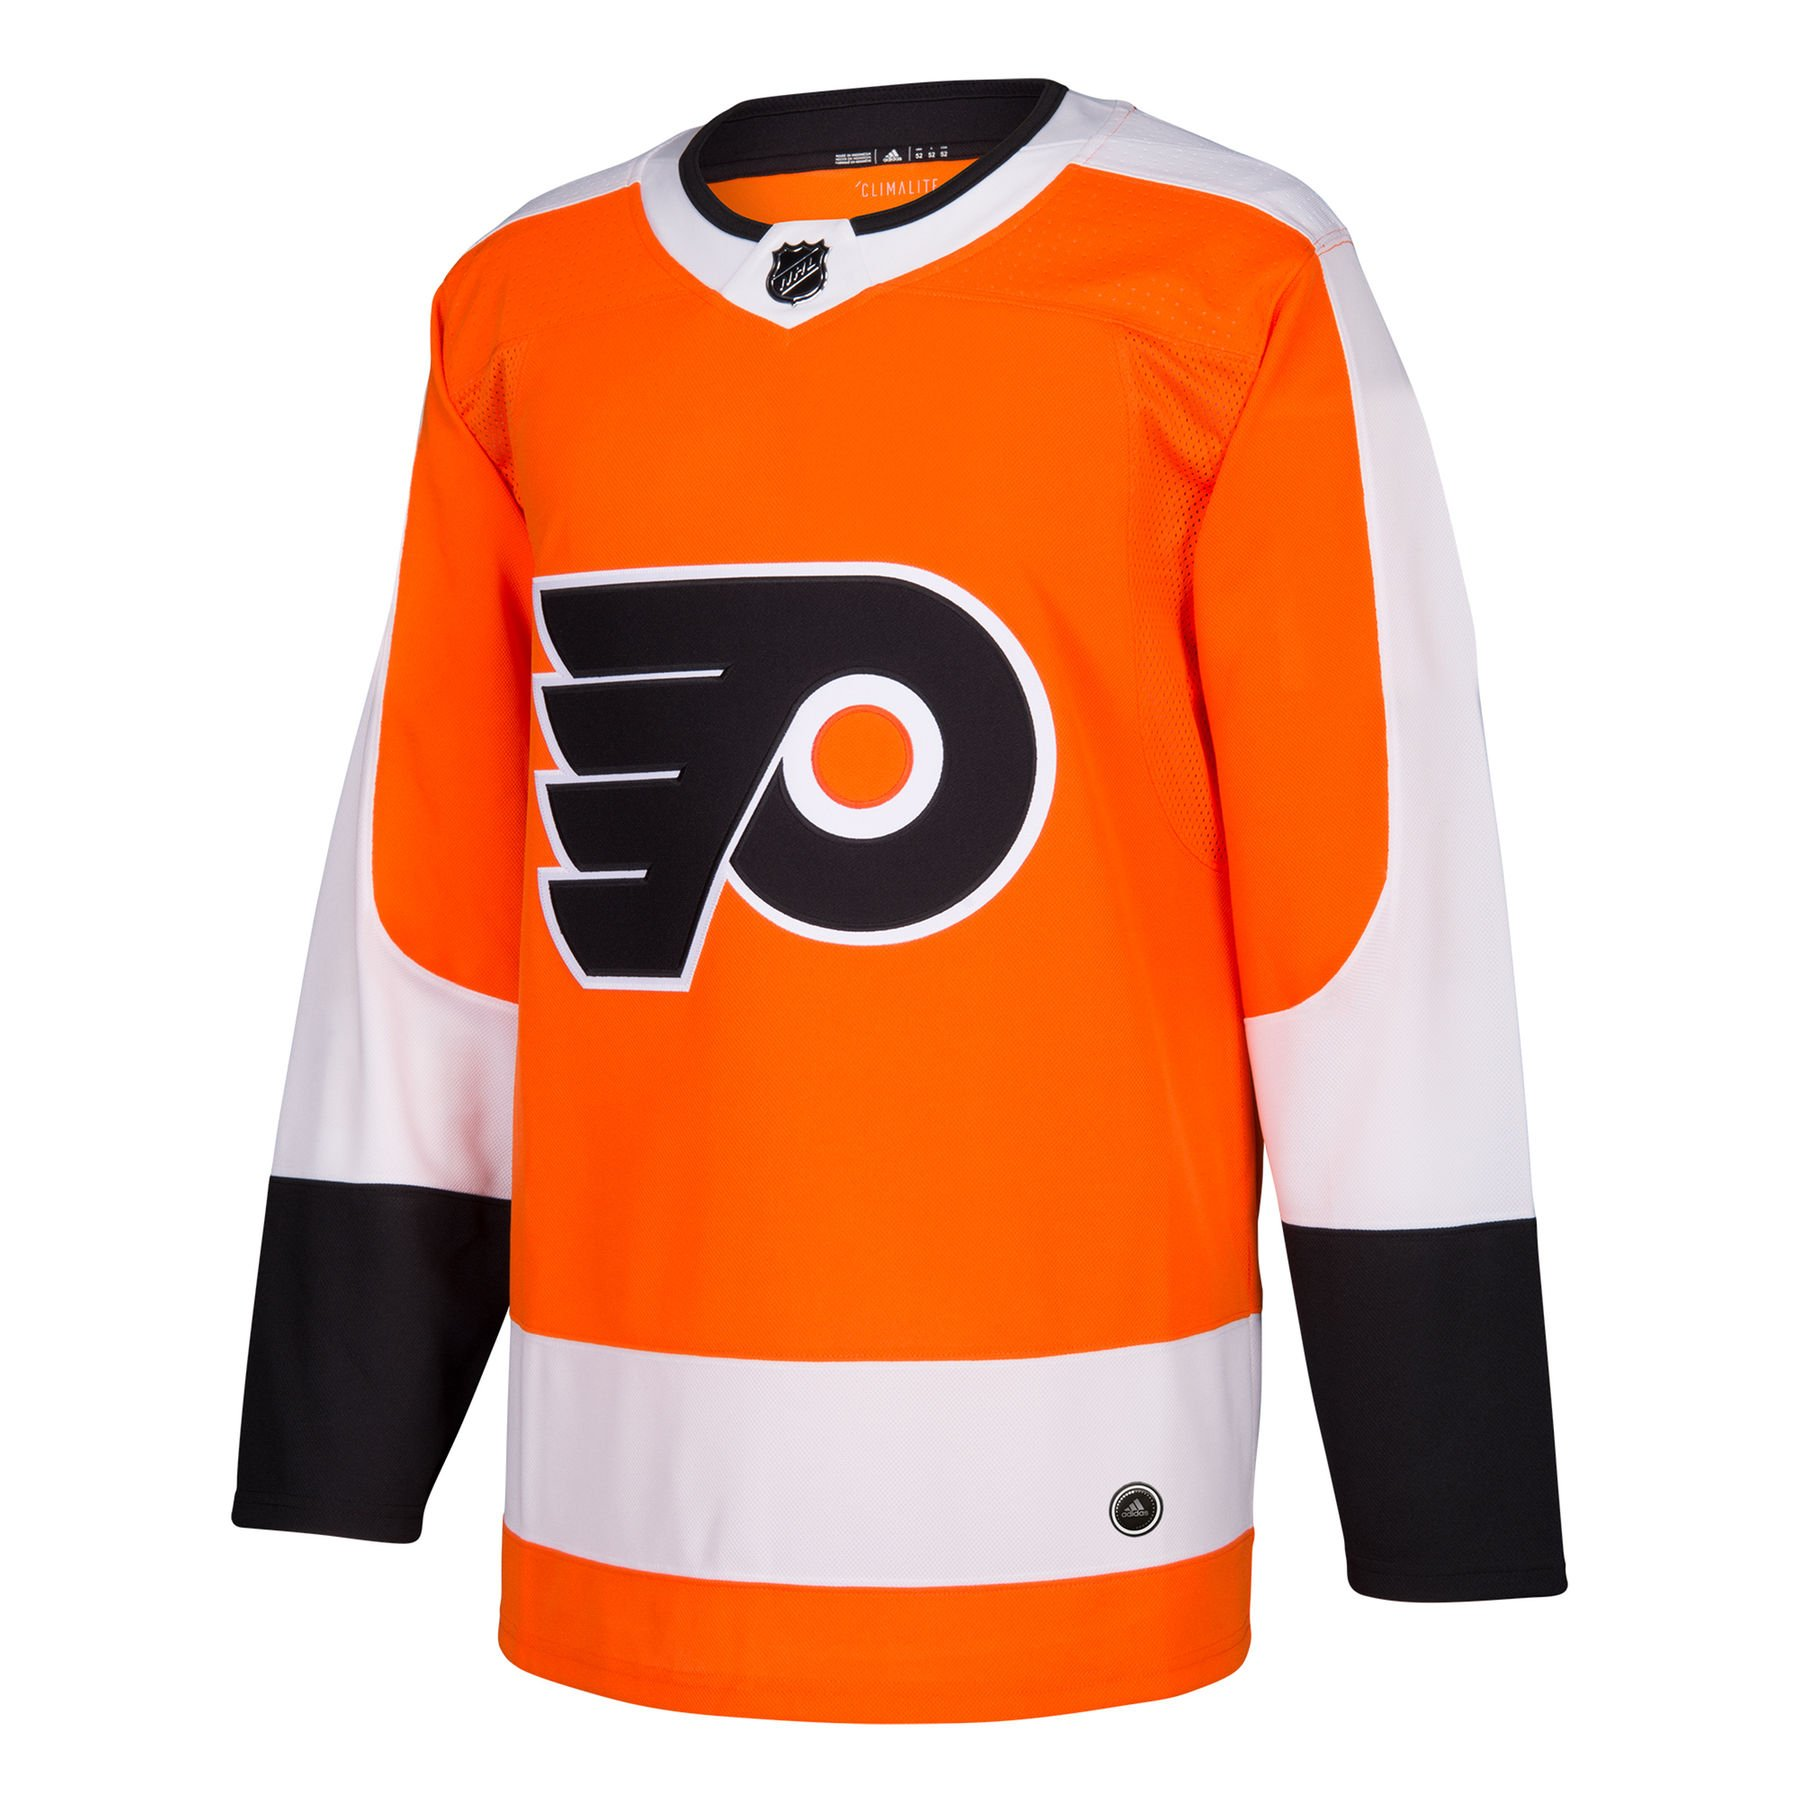 adidas Flyers Home Authentic Pro Jersey - Men's Hockey 44 Orange/White/Black